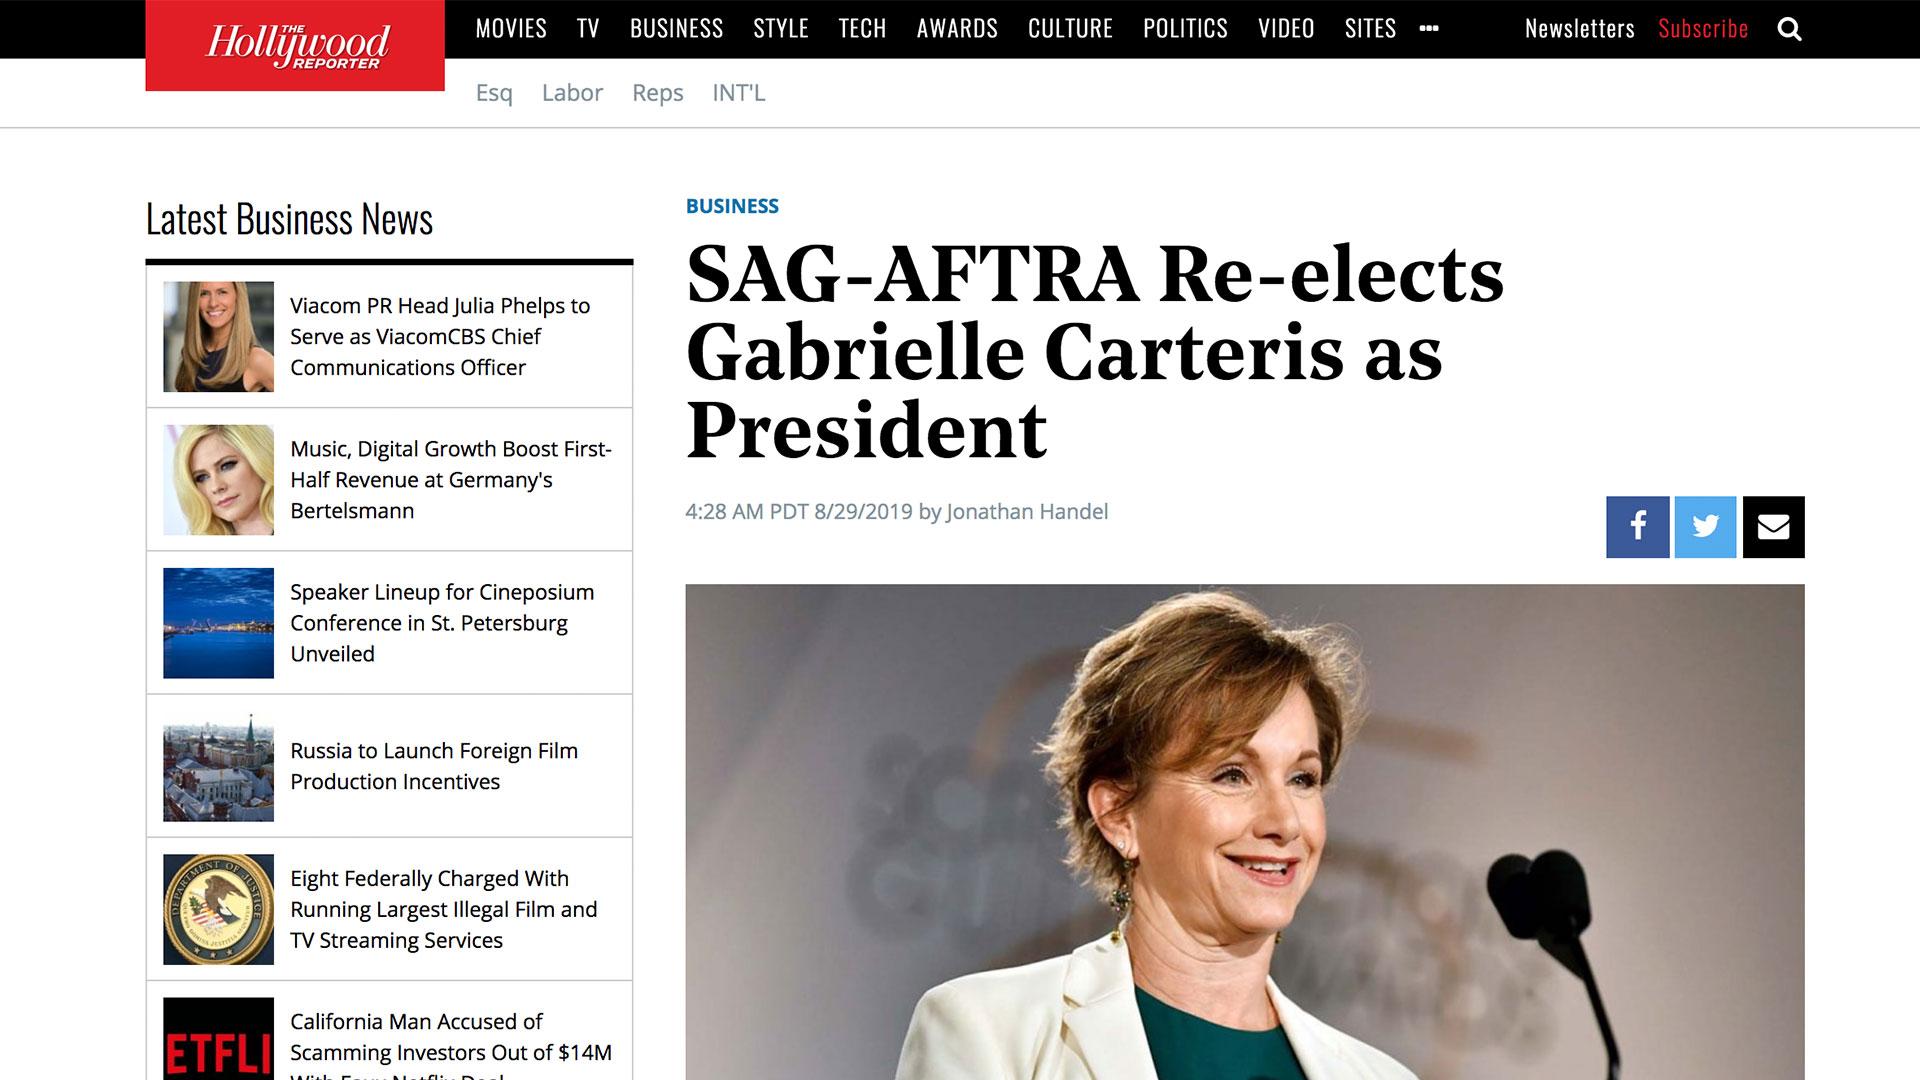 Fairness Rocks News SAG-AFTRA Re-elects Gabrielle Carteris as President